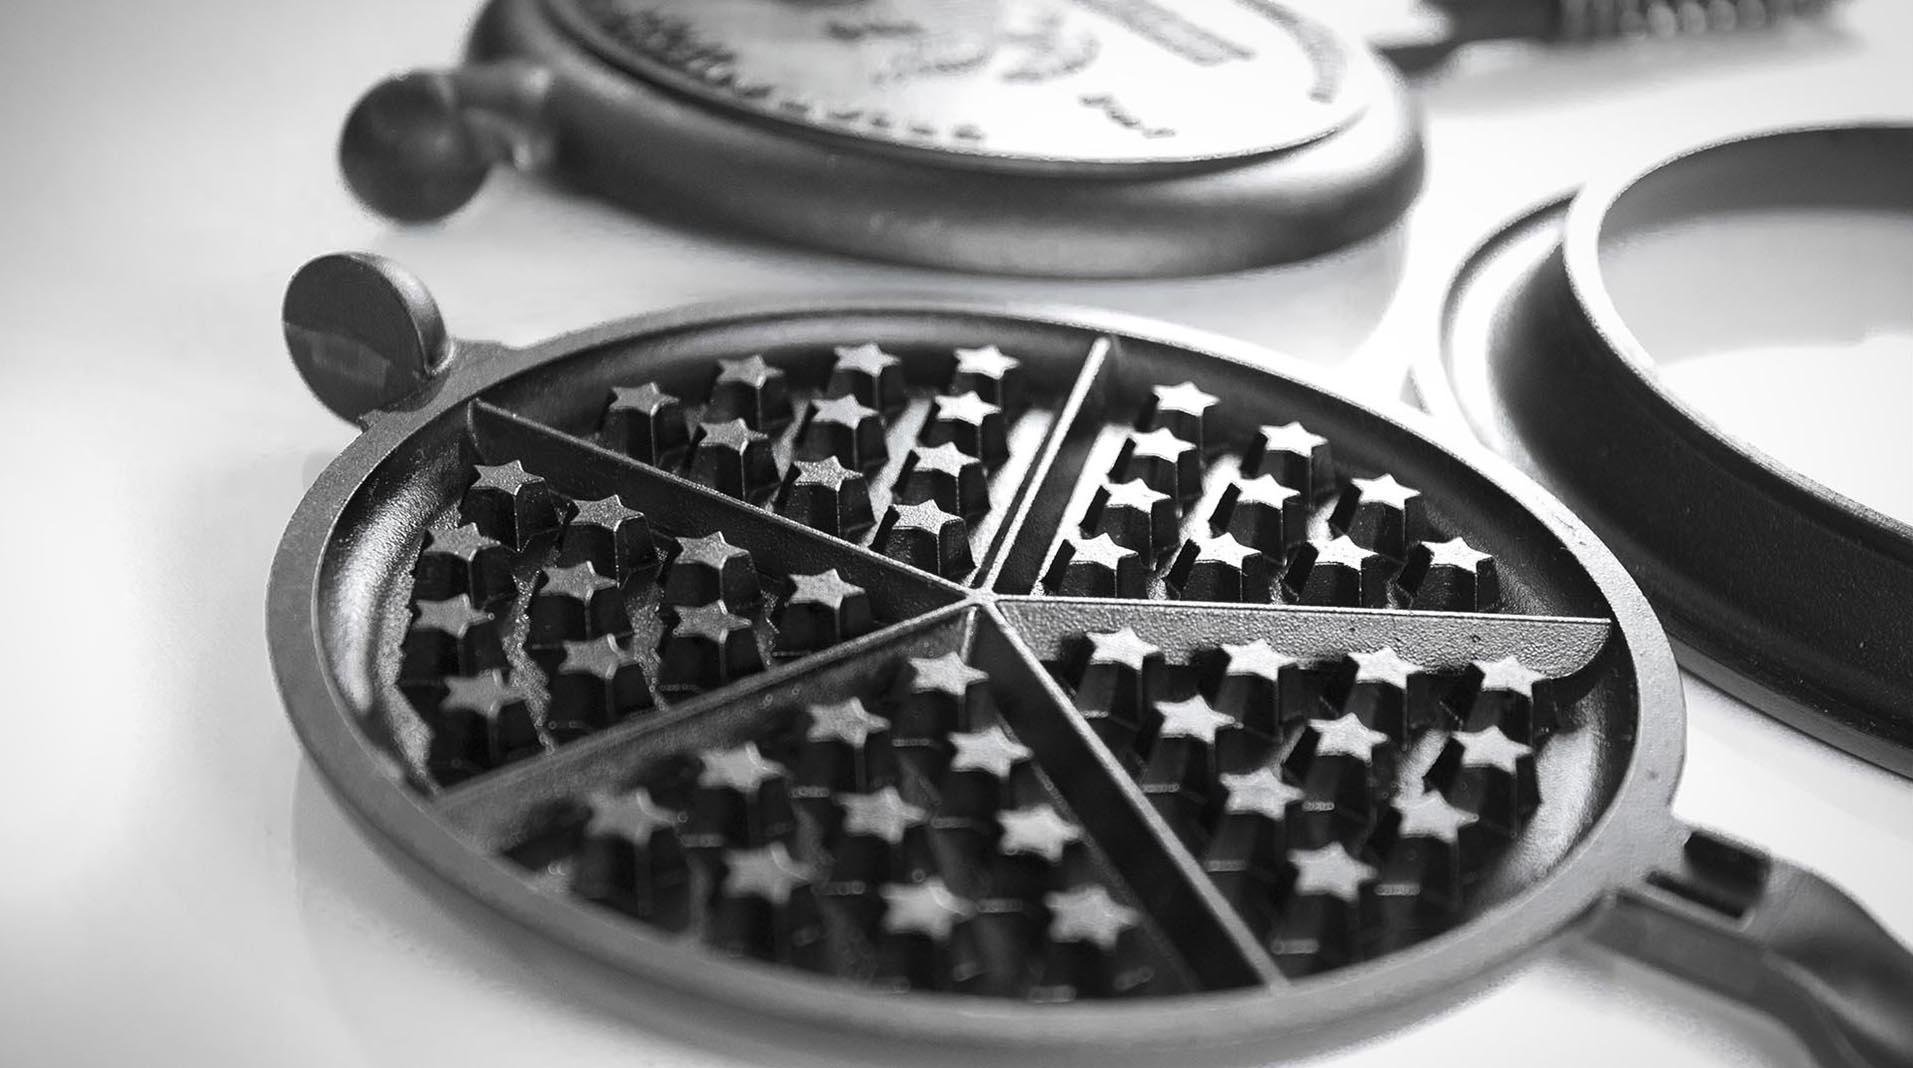 Great American Waffle Iron star pattern detail 1